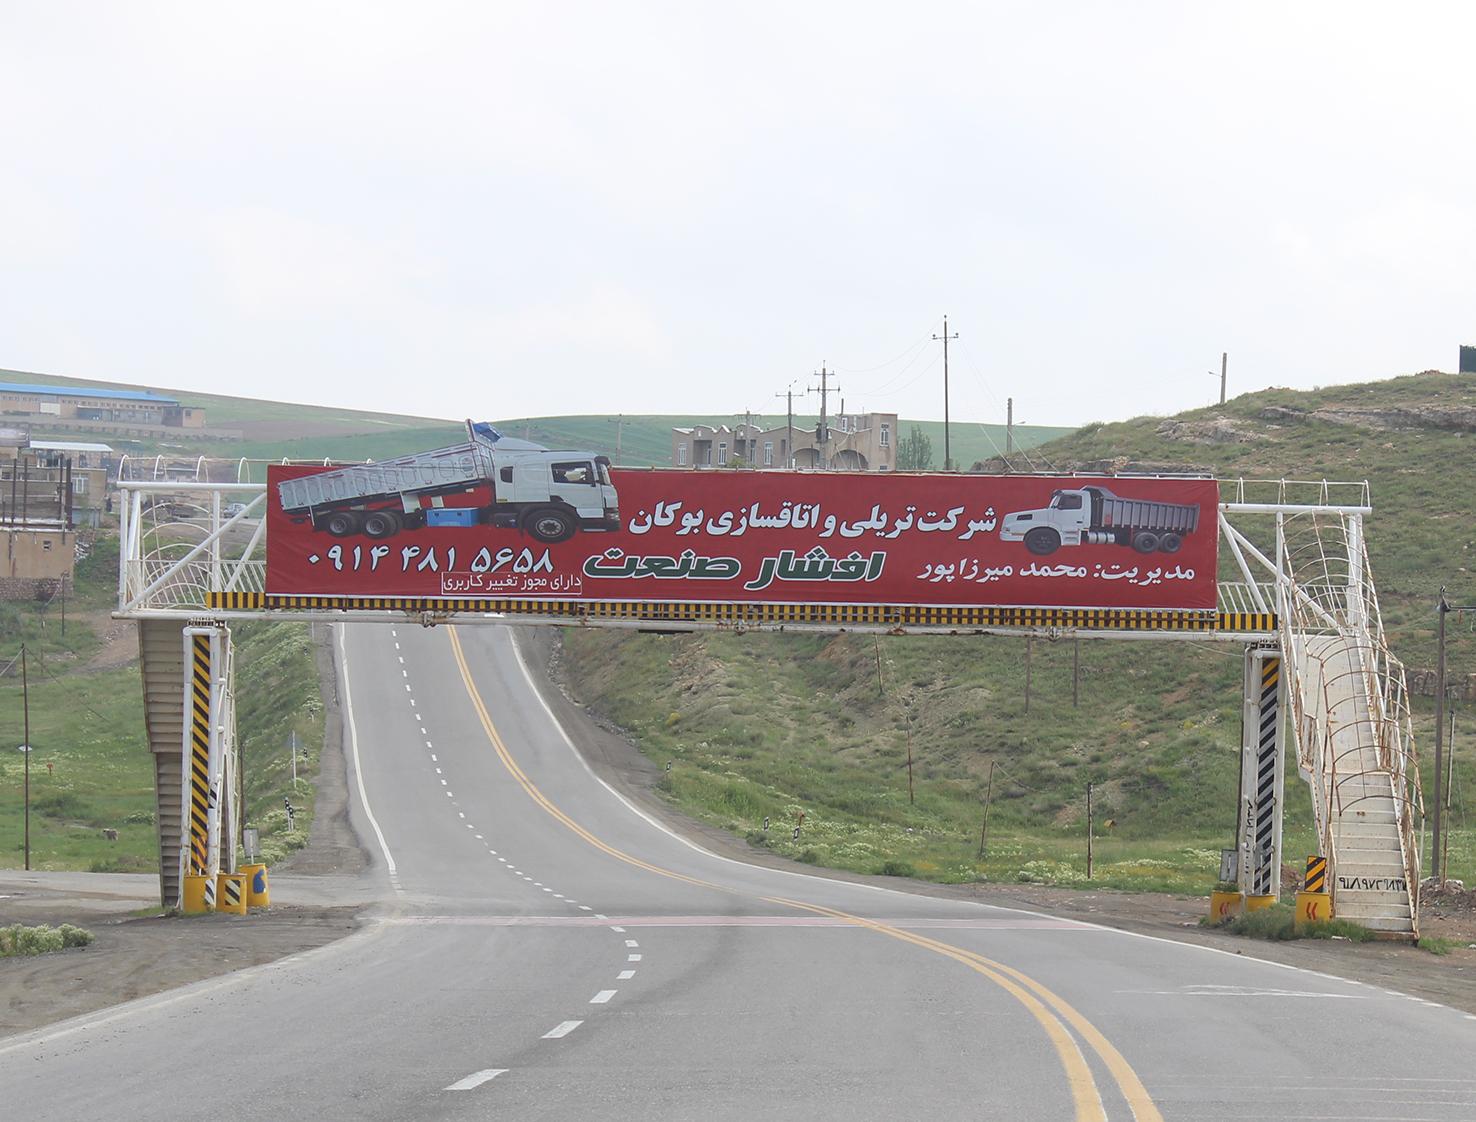 بیلبورد تبلیغاتی محور دیواندره سقز ، پل عابر پیاده رشید آباد